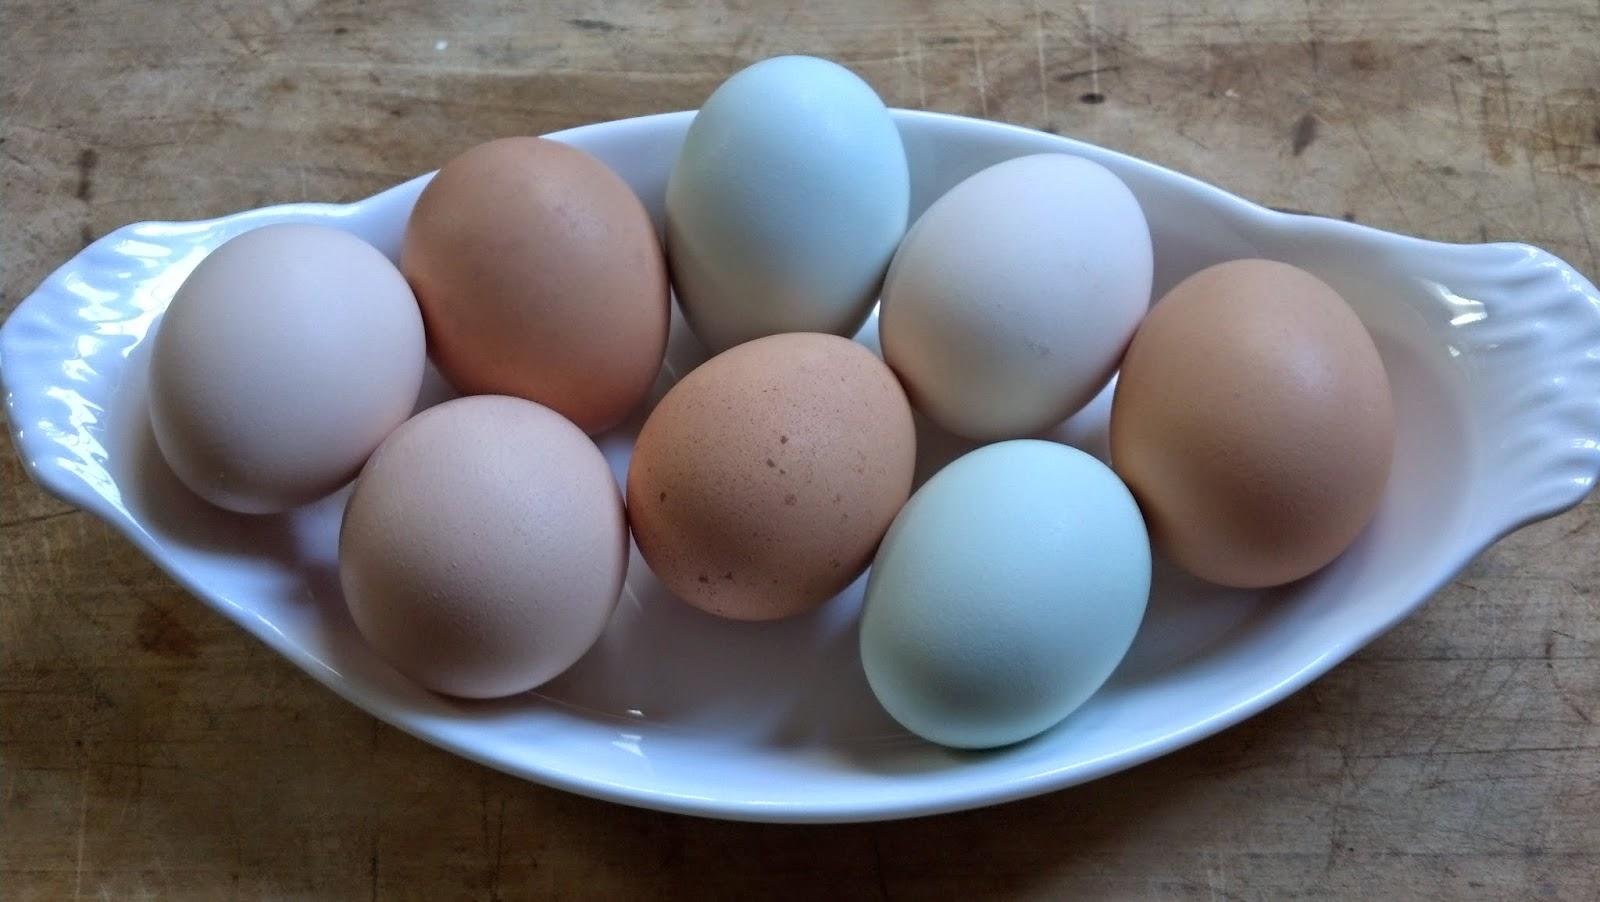 how to make a slightly runny boiled egg